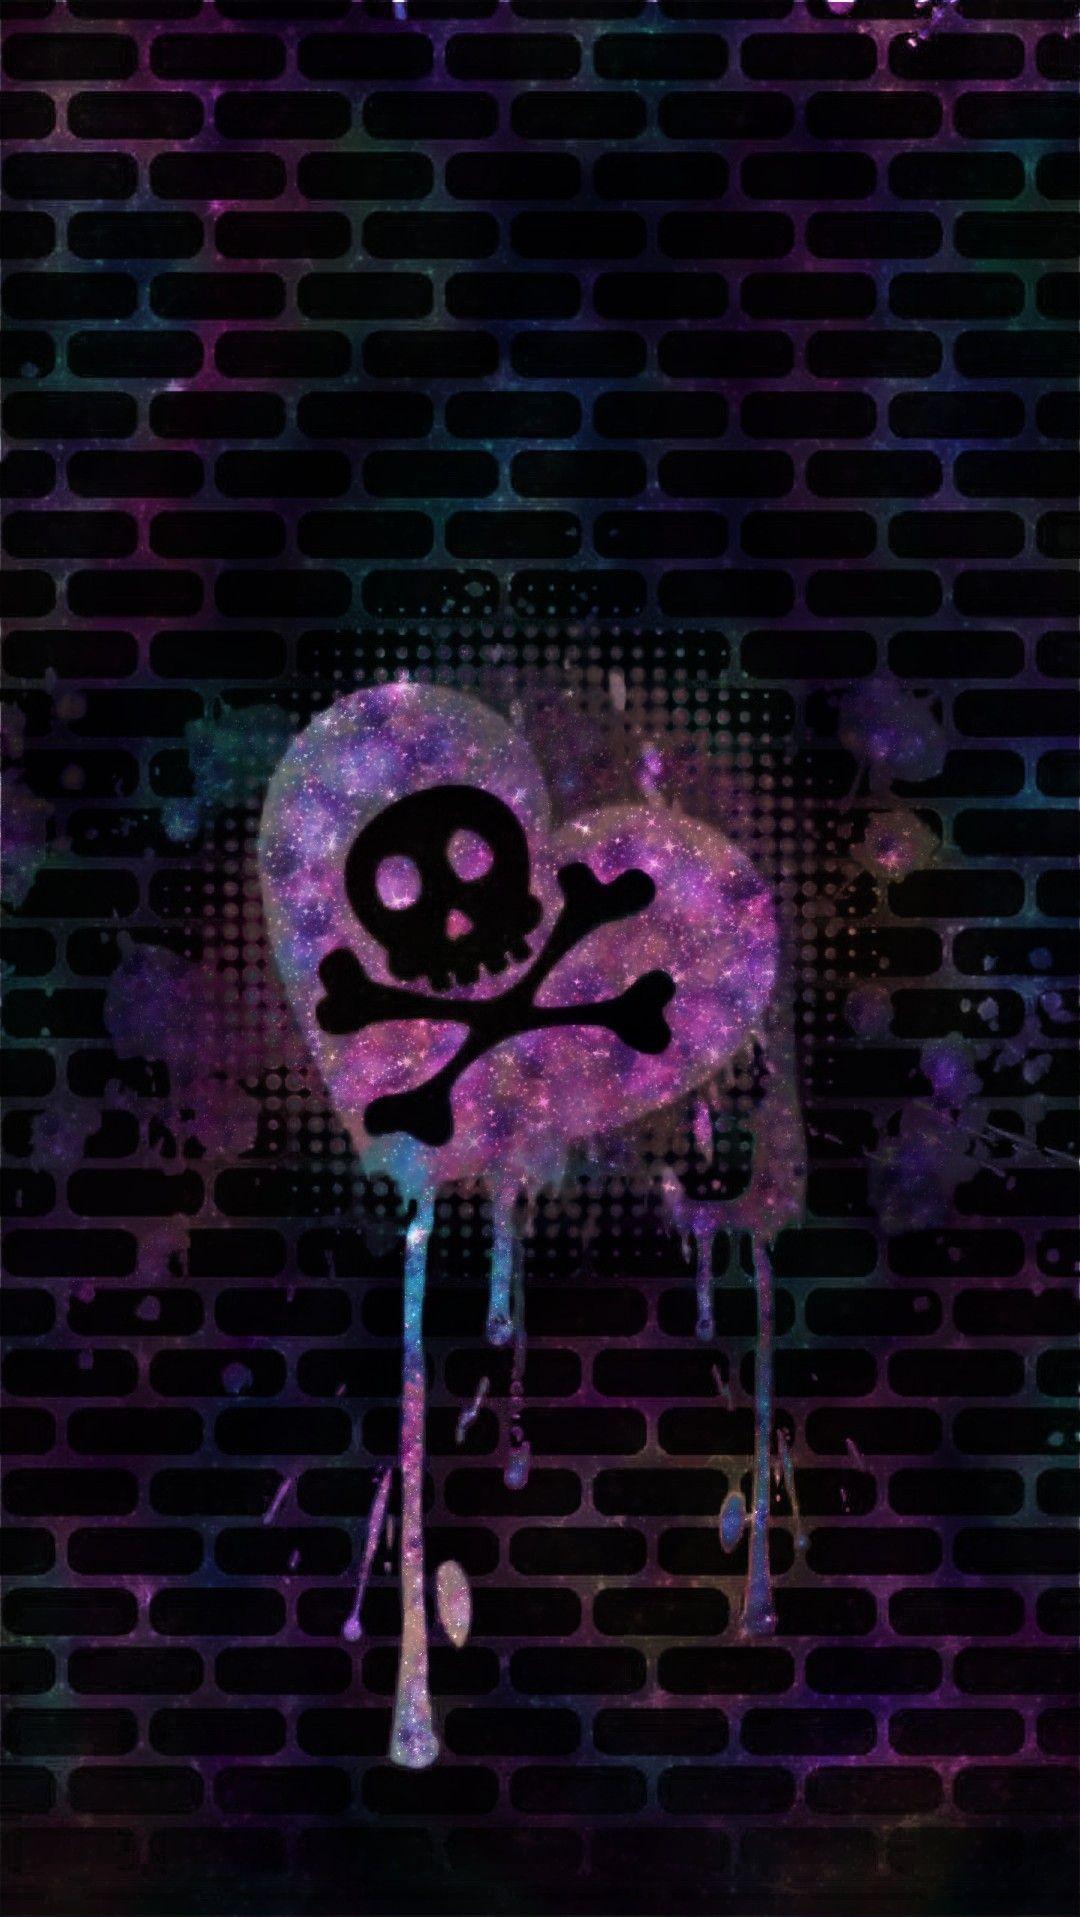 ac489dd06e1 Skull Graffiti Galaxy, made by me #patterns #colorful #glitter ...